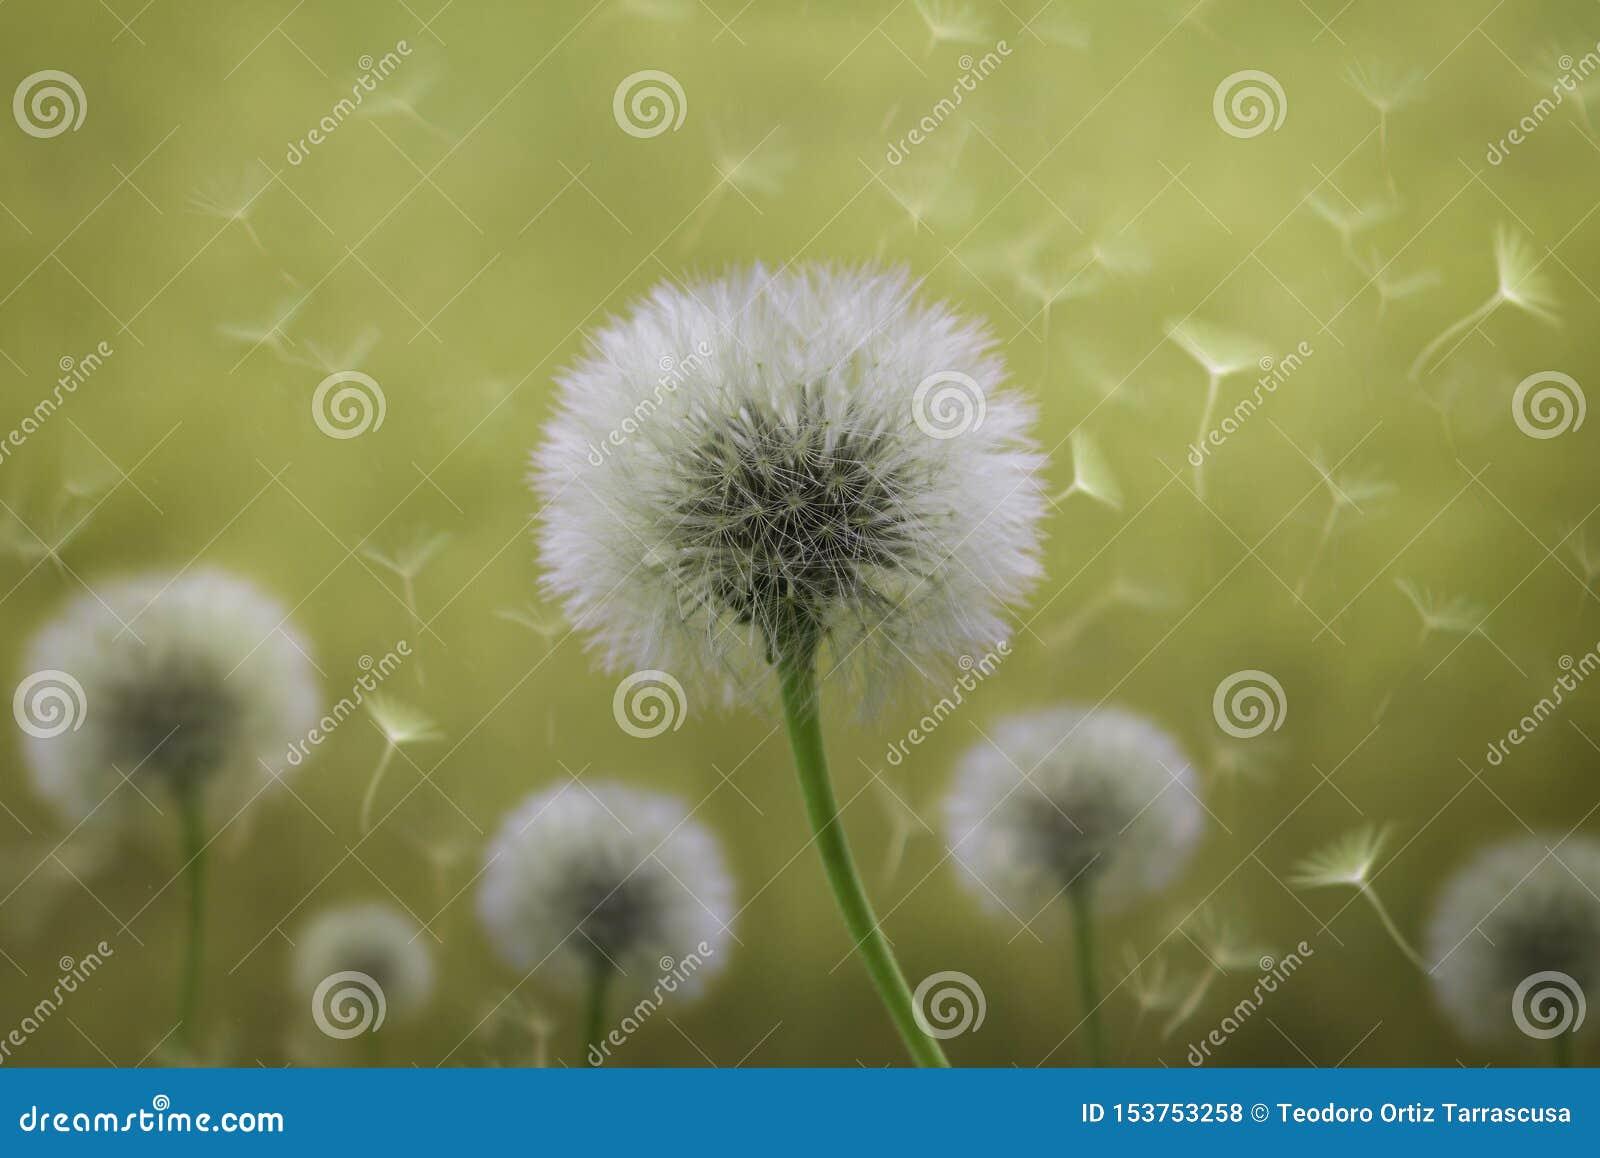 Single Dandelion Seedling Clip Art